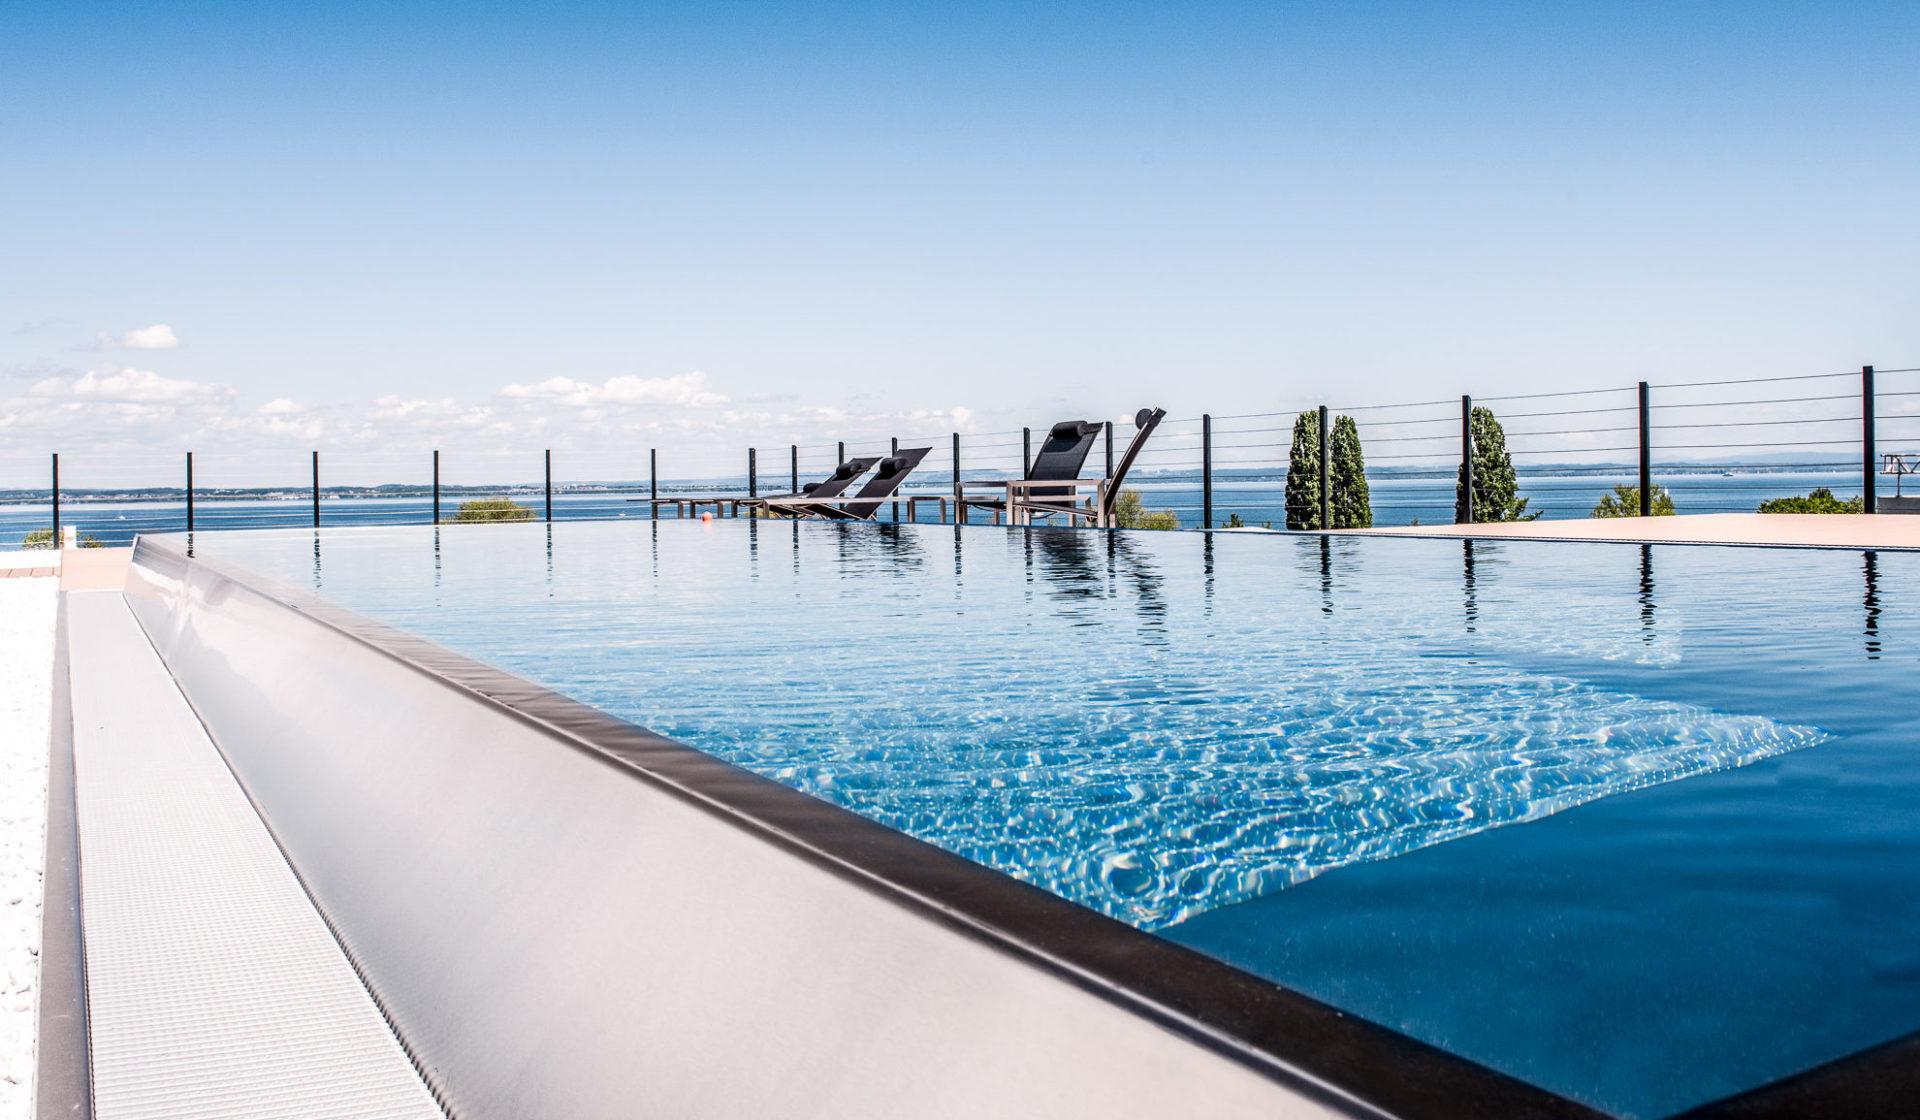 Swimmingpool Chromstahl infiniti überlauf